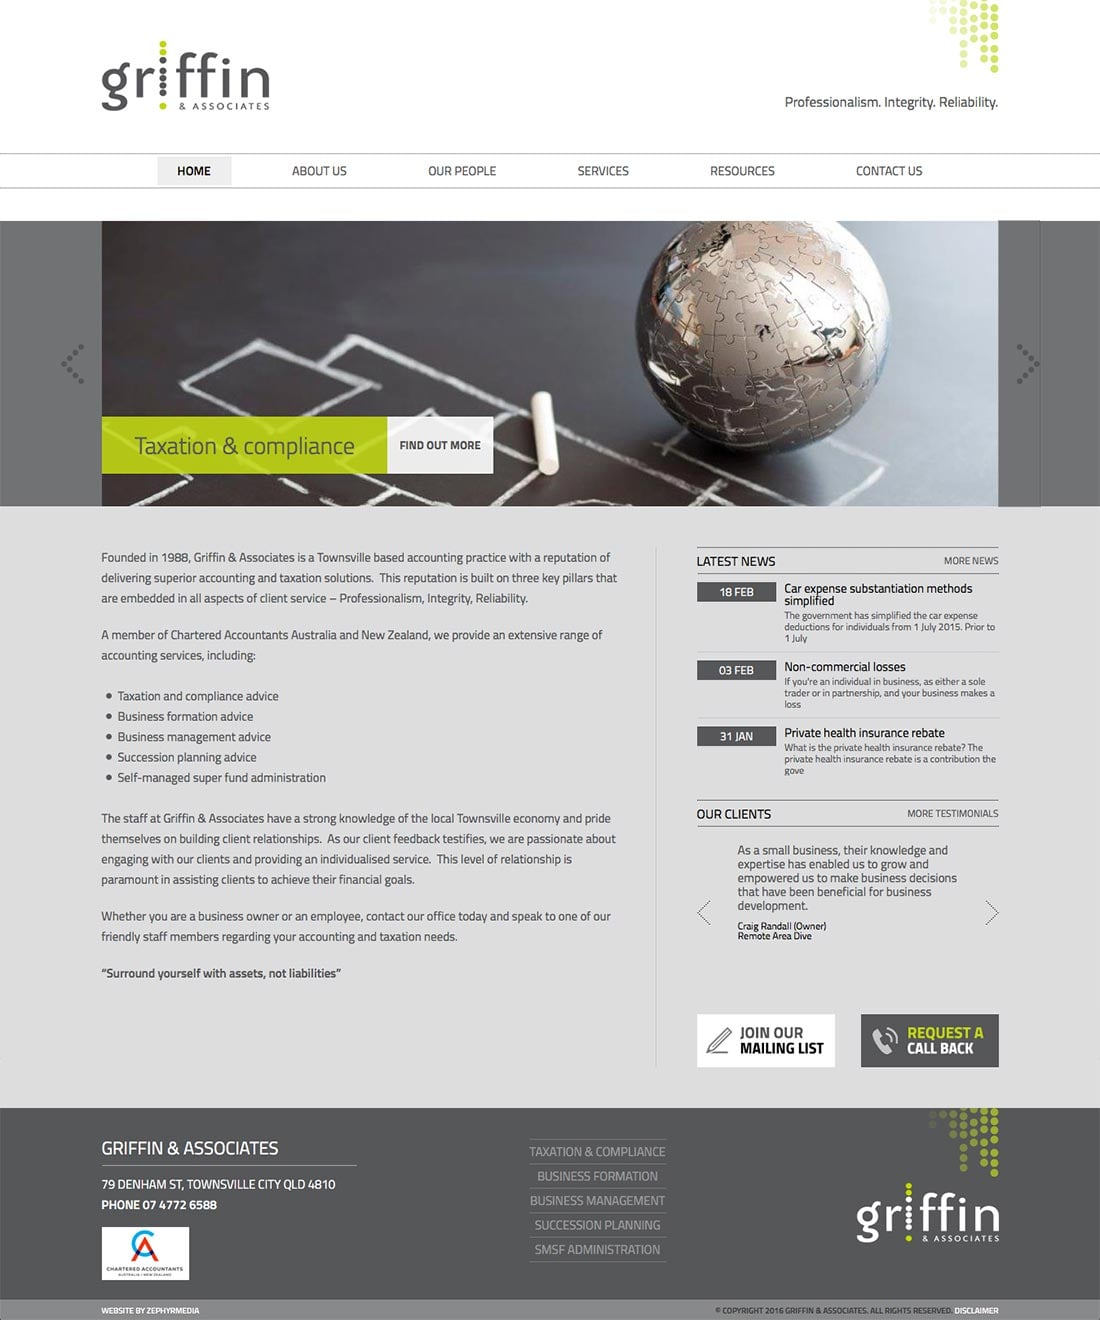 New Brand & Website by Zephyrmedia